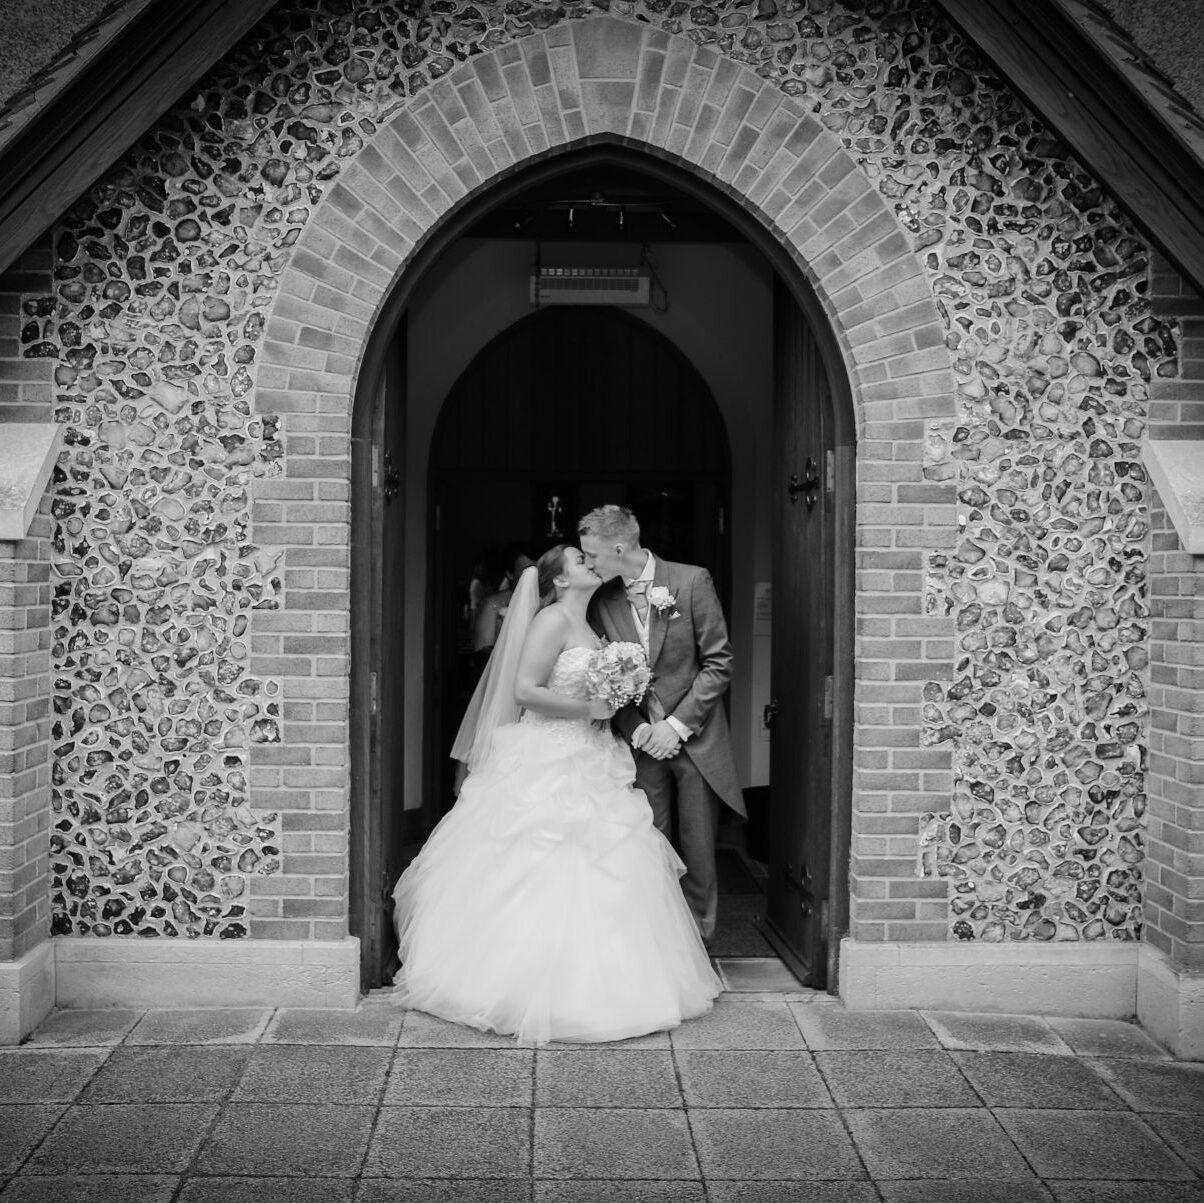 Wedding Photography in St. Paul's Church, Letchworth, Hertfordshire - Ryan Hughes Photography - 158